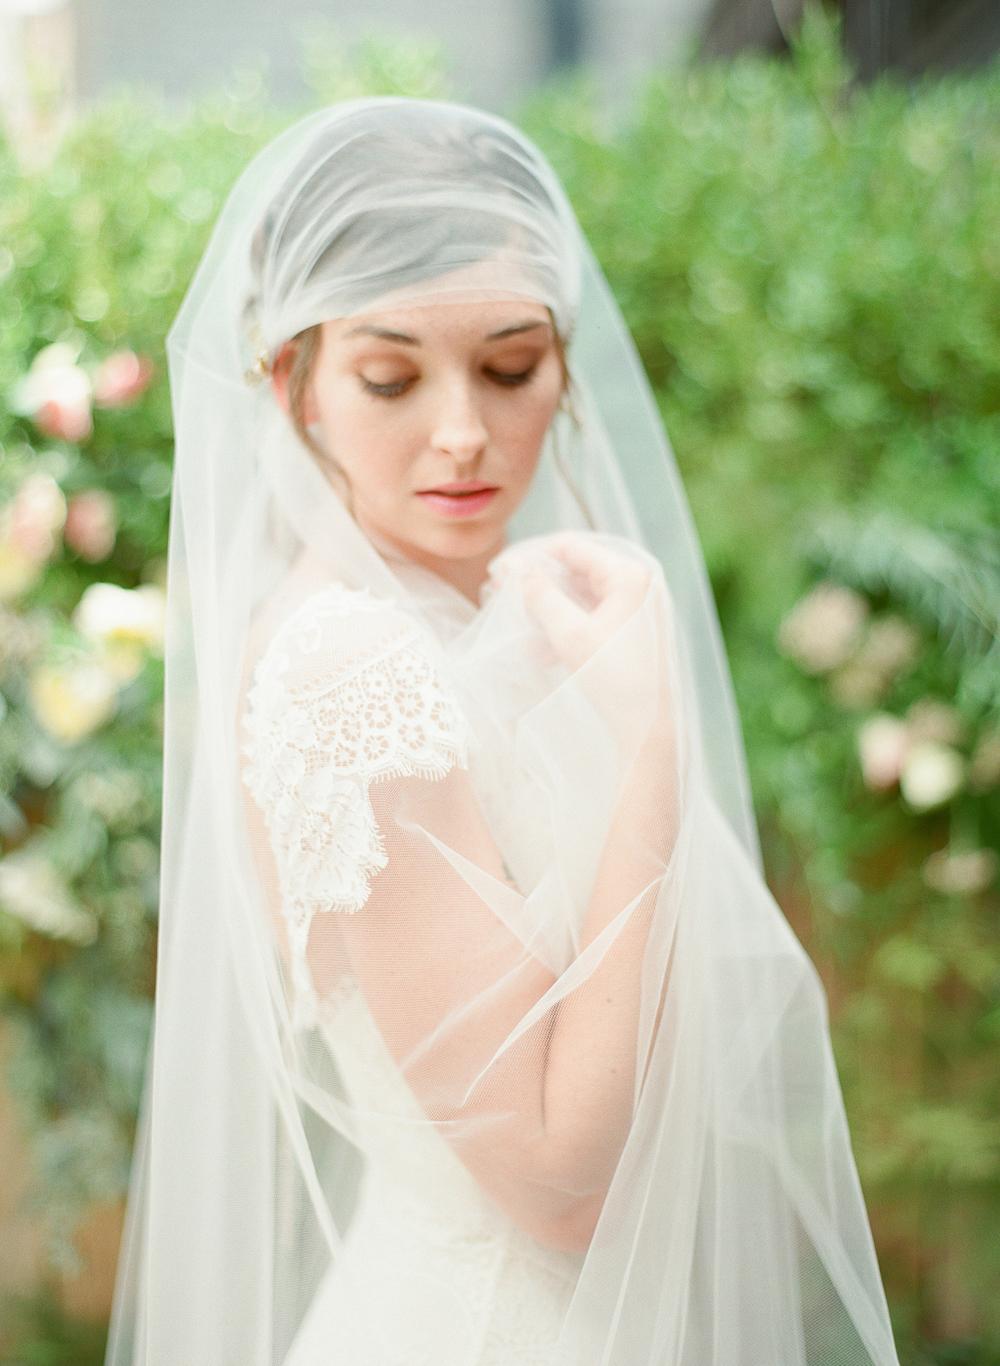 juliet cap tulle veil with gold vine flower crystal detail hushed commotion